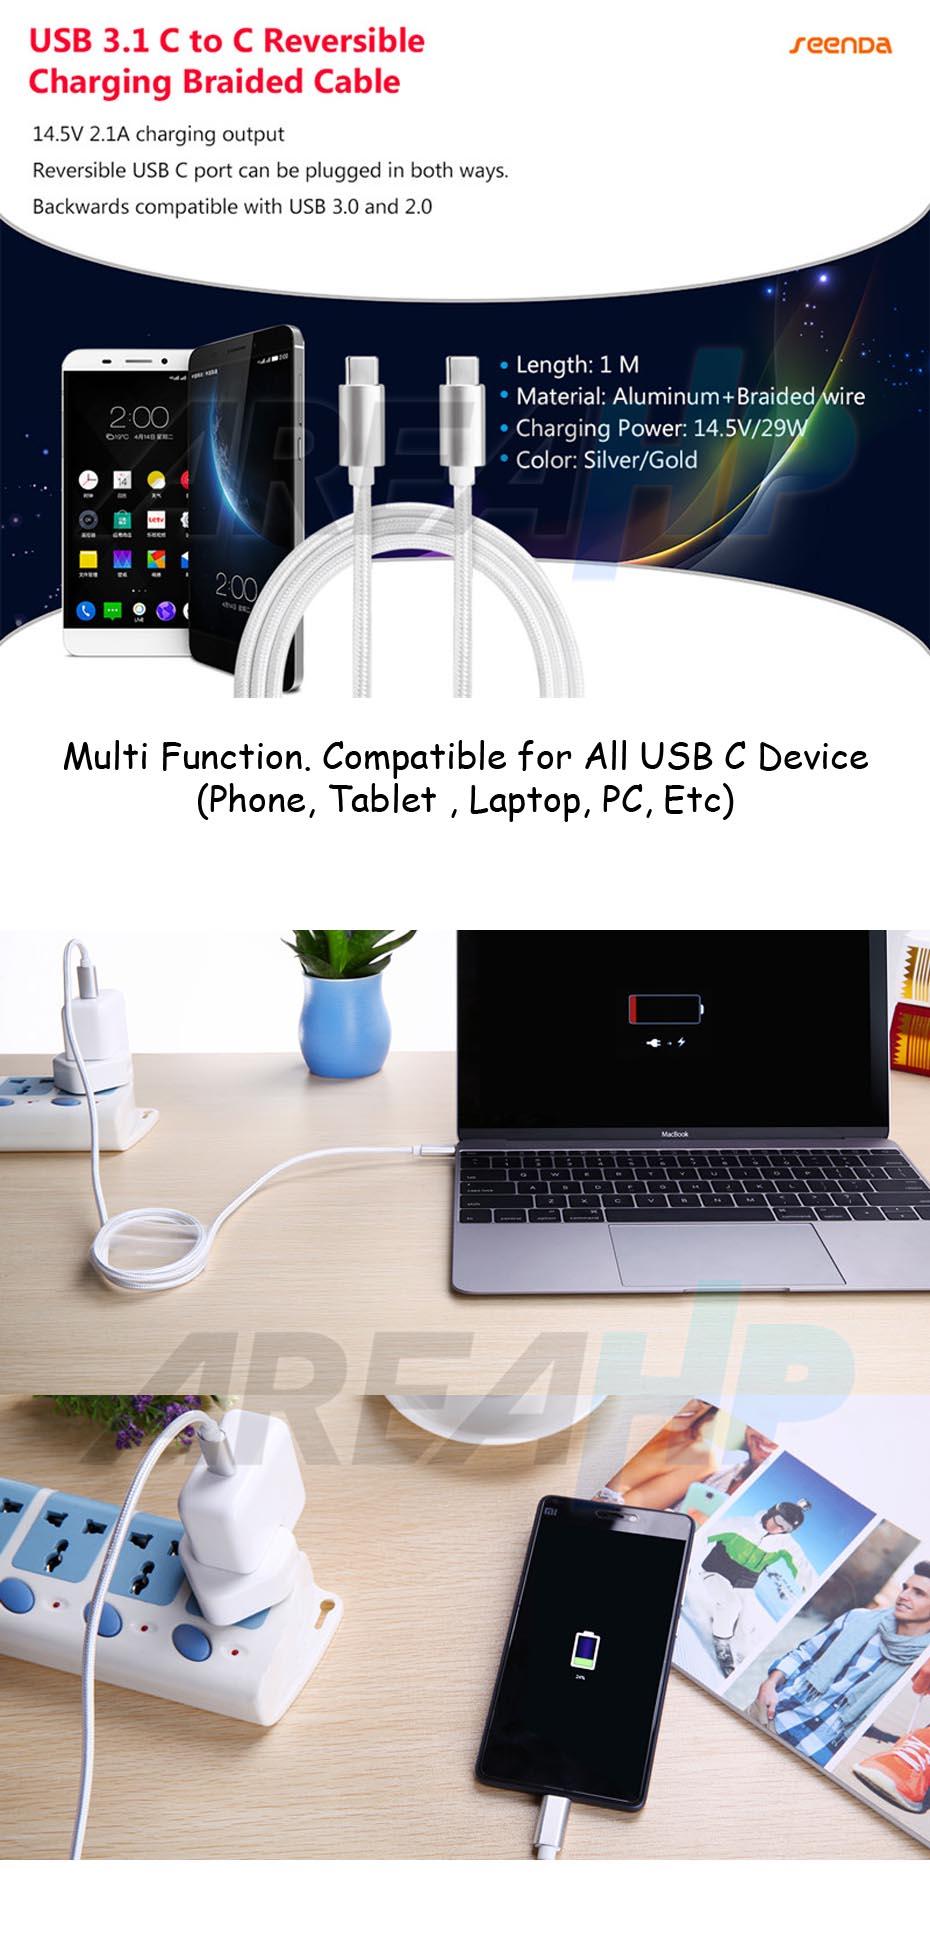 Seenda USB C to USB C Cable IPS-11C Overview